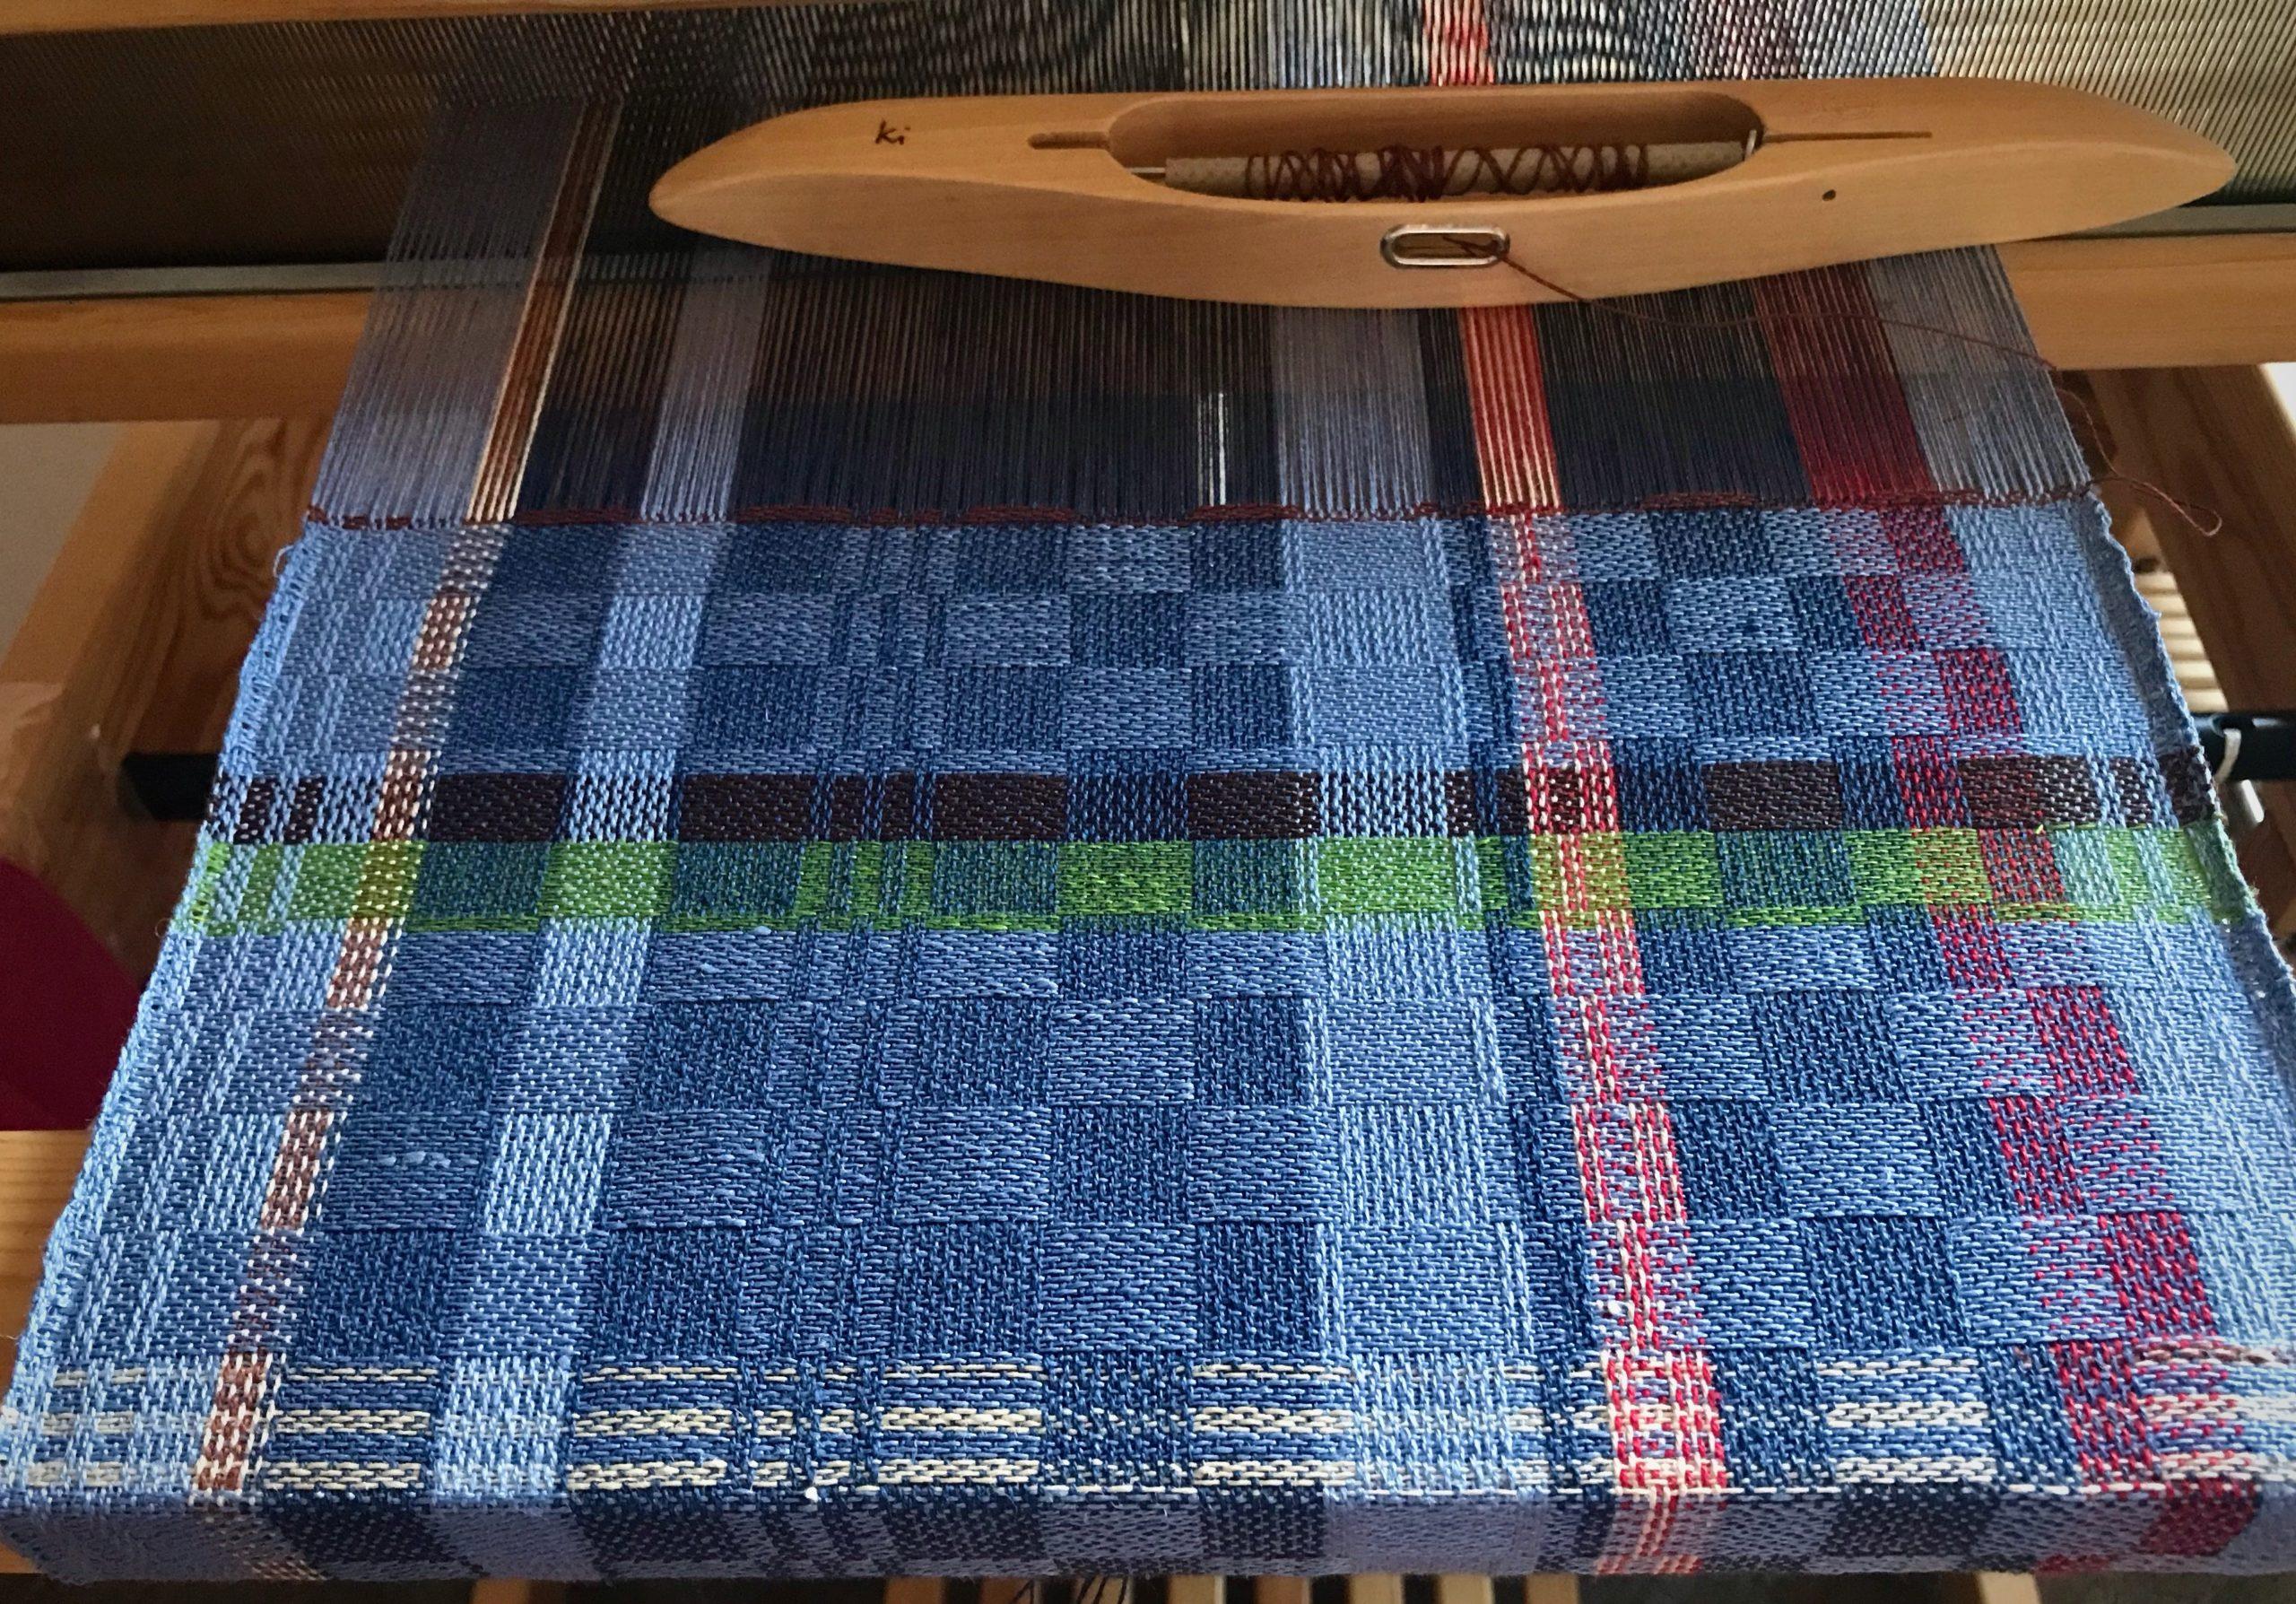 Humble linen wash cloths on the loom.